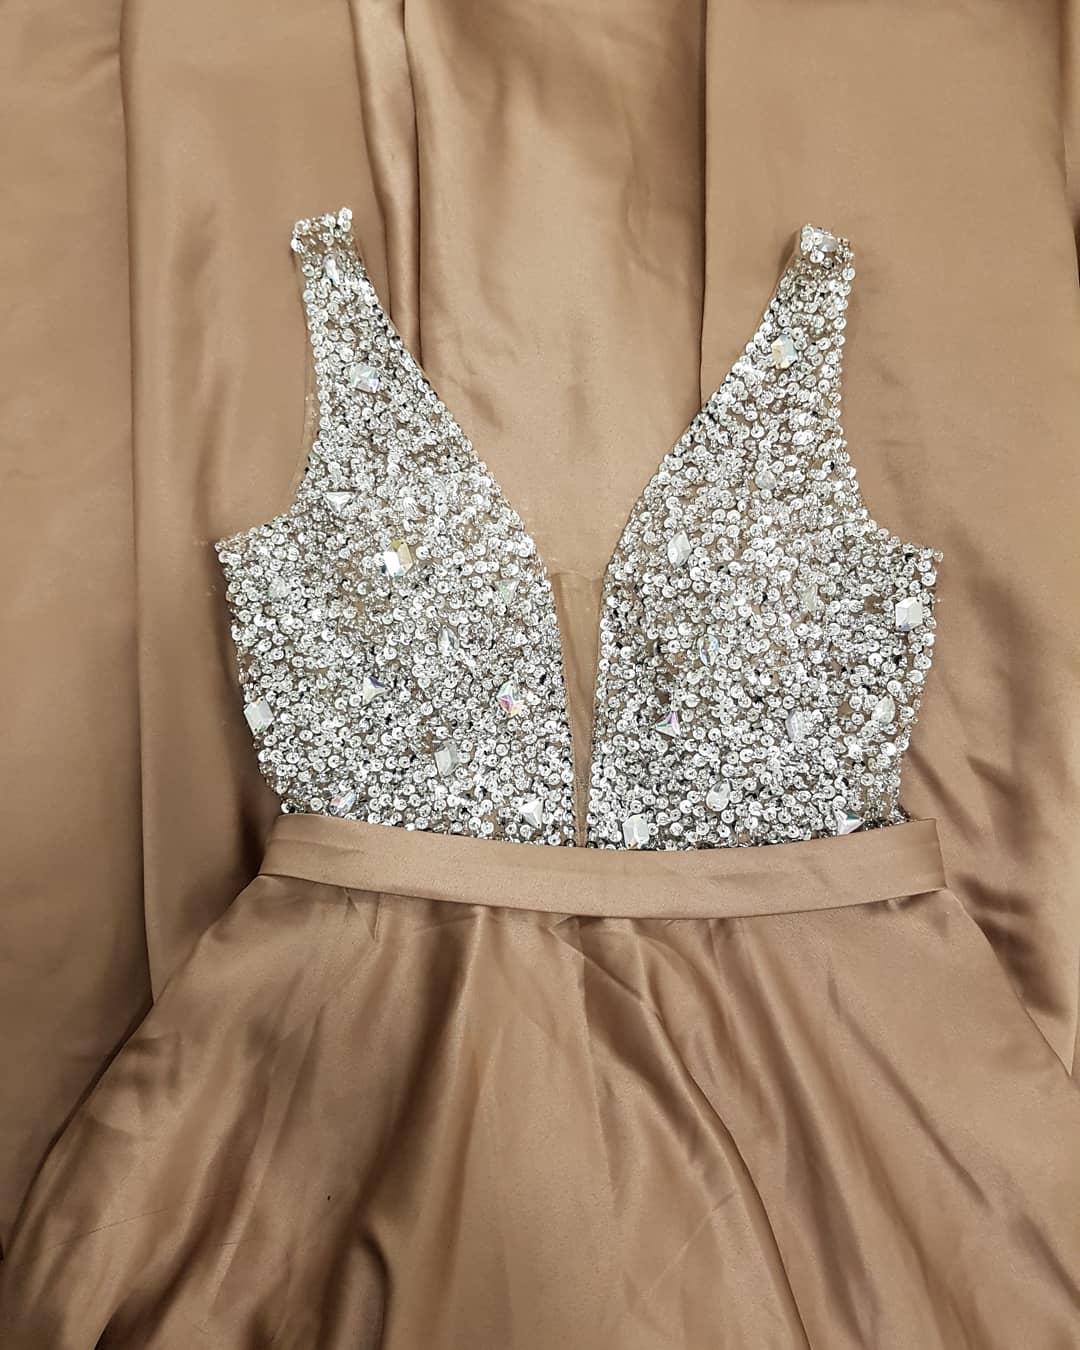 7df9af777fa3 Sparkly Sequins Champagne Long Prom Dress · wendyhouse · Online ...